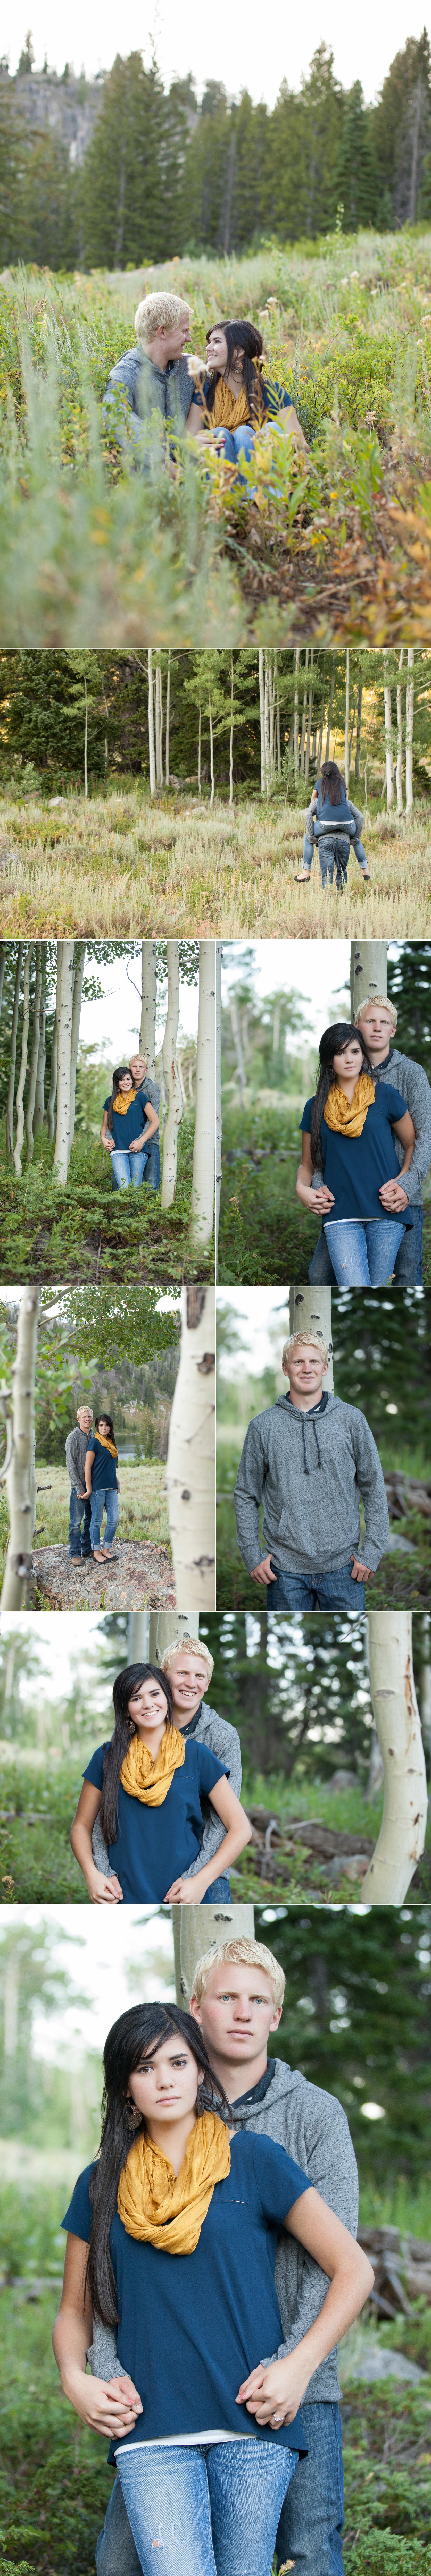 LoganUtahEngagementsTylerryephotography.jpg